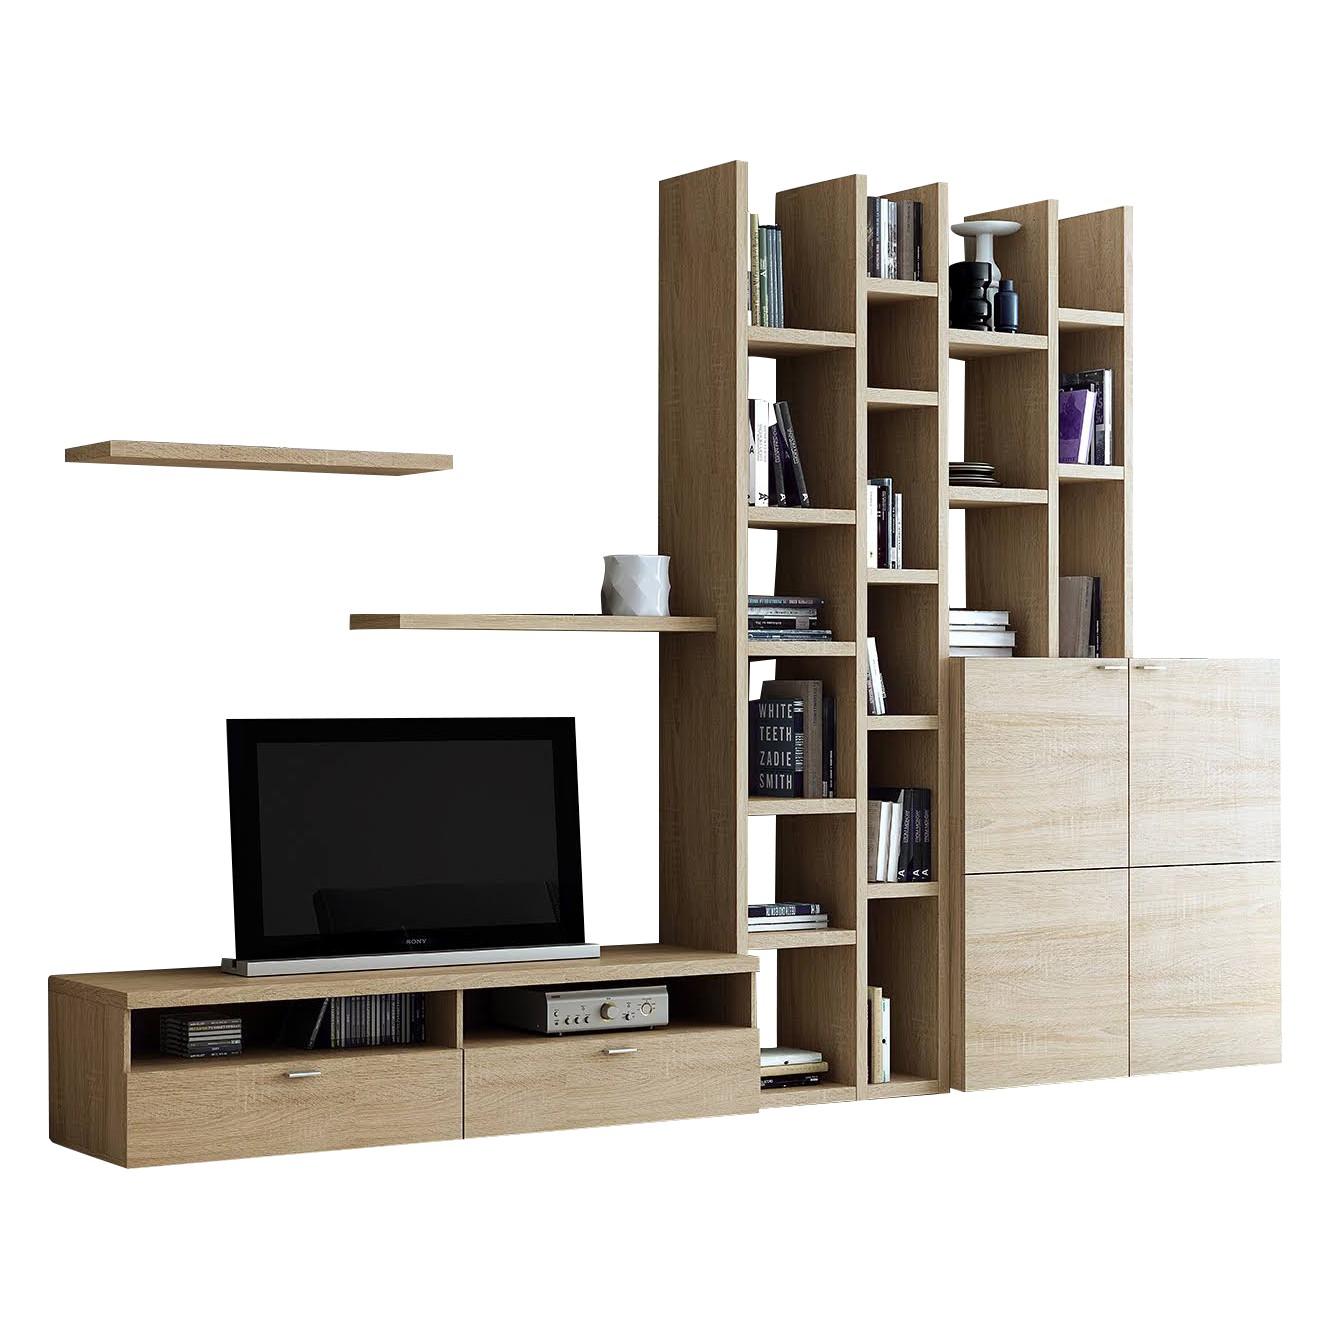 wohnwand altona jeanne and jerome. Black Bedroom Furniture Sets. Home Design Ideas